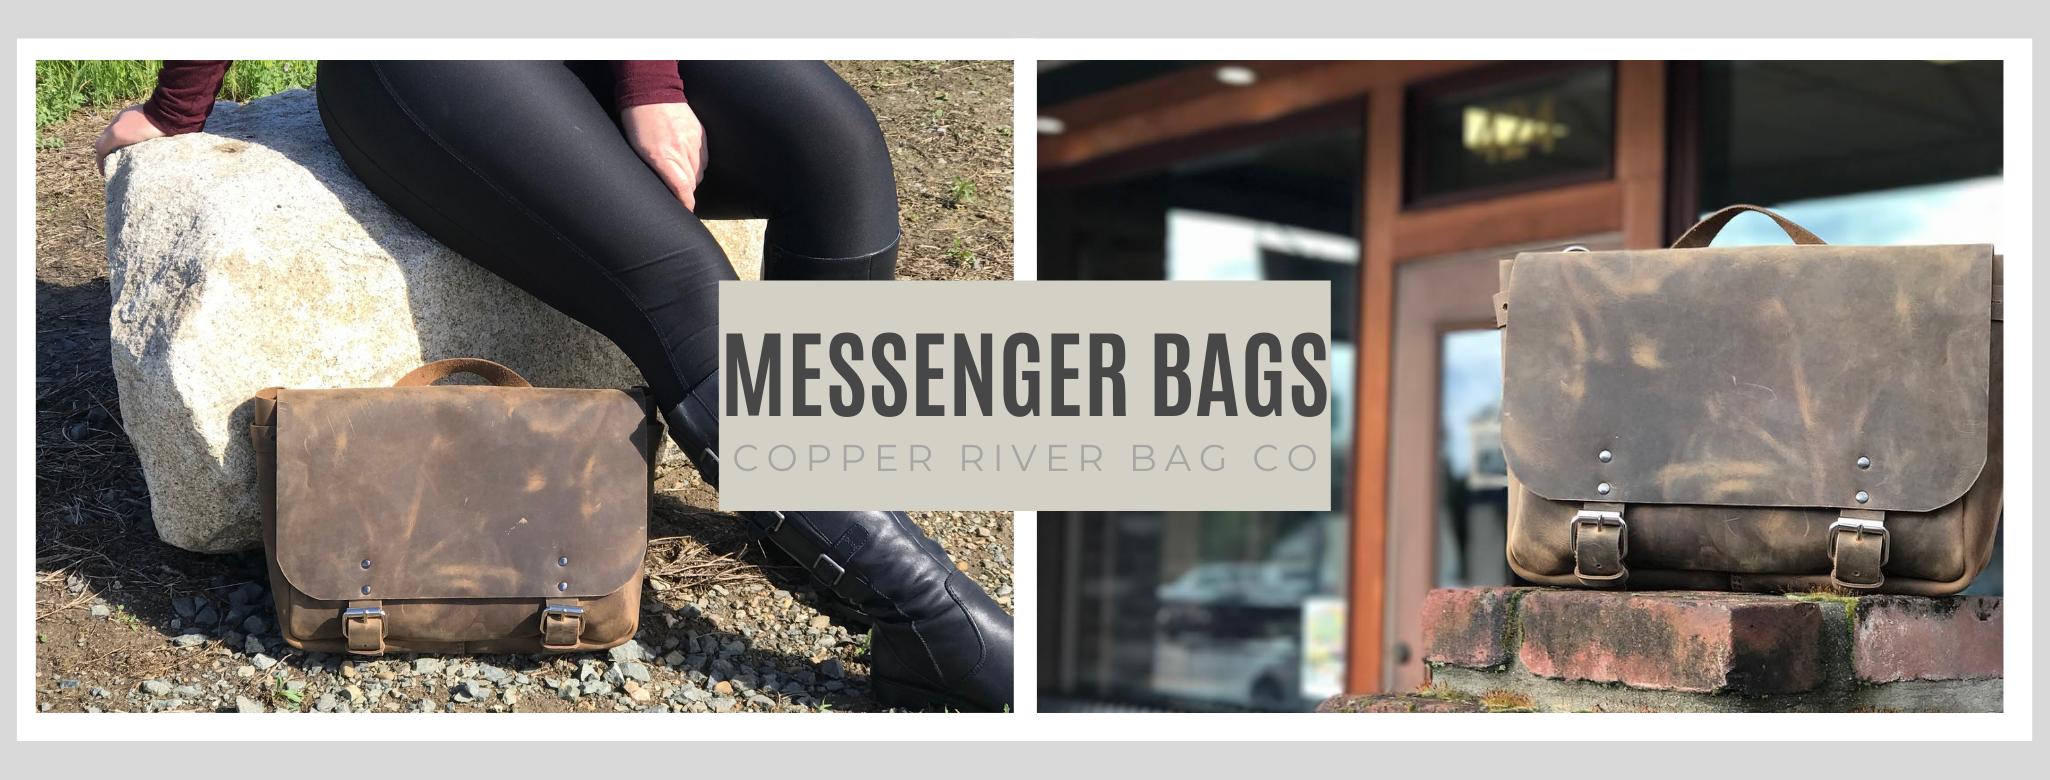 messenger-bags-banner.png